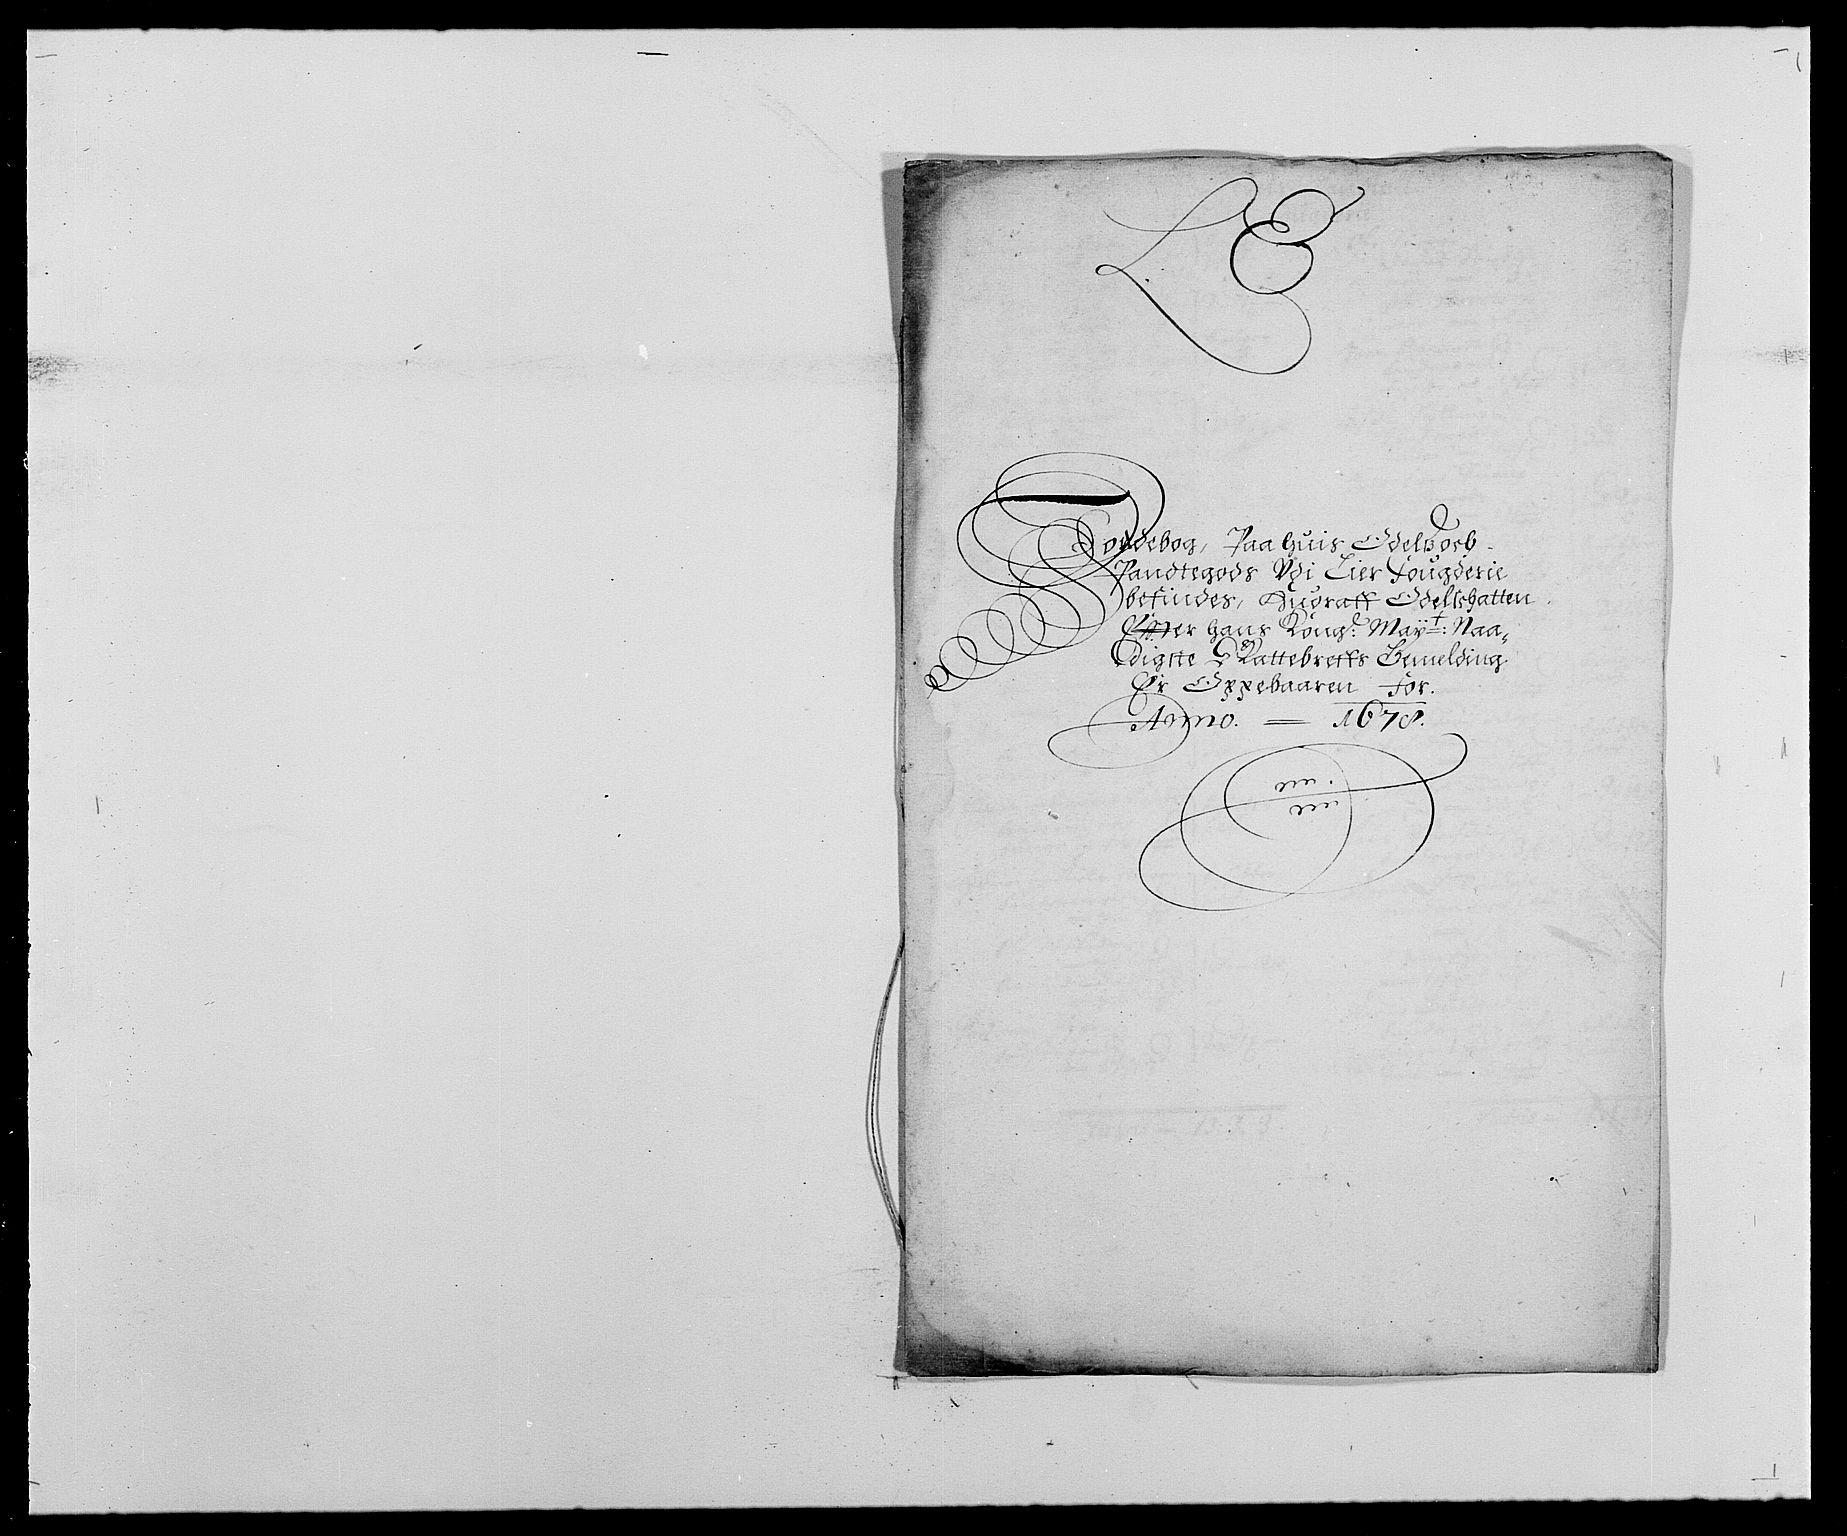 RA, Rentekammeret inntil 1814, Reviderte regnskaper, Fogderegnskap, R27/L1686: Fogderegnskap Lier, 1678-1686, s. 87